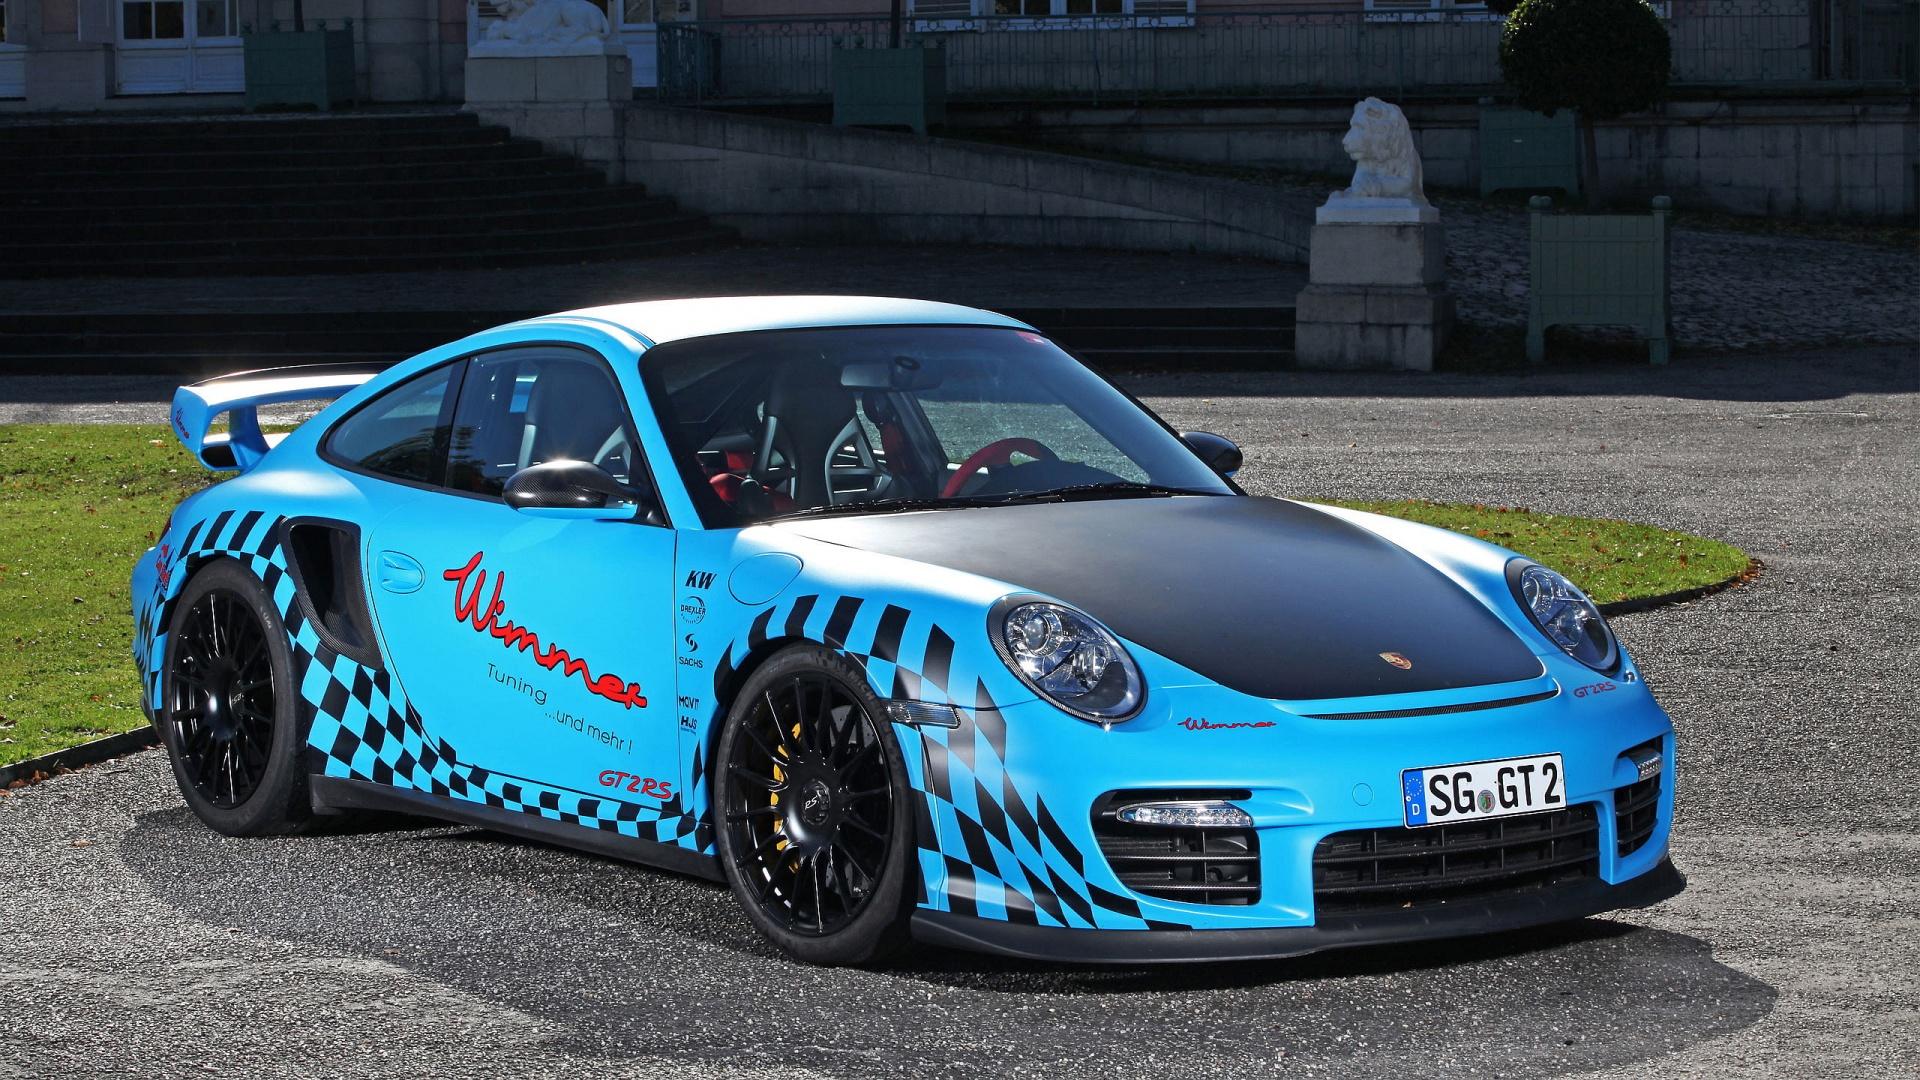 Porsche 911 Modified Car Wallpaper 1920x1080 |